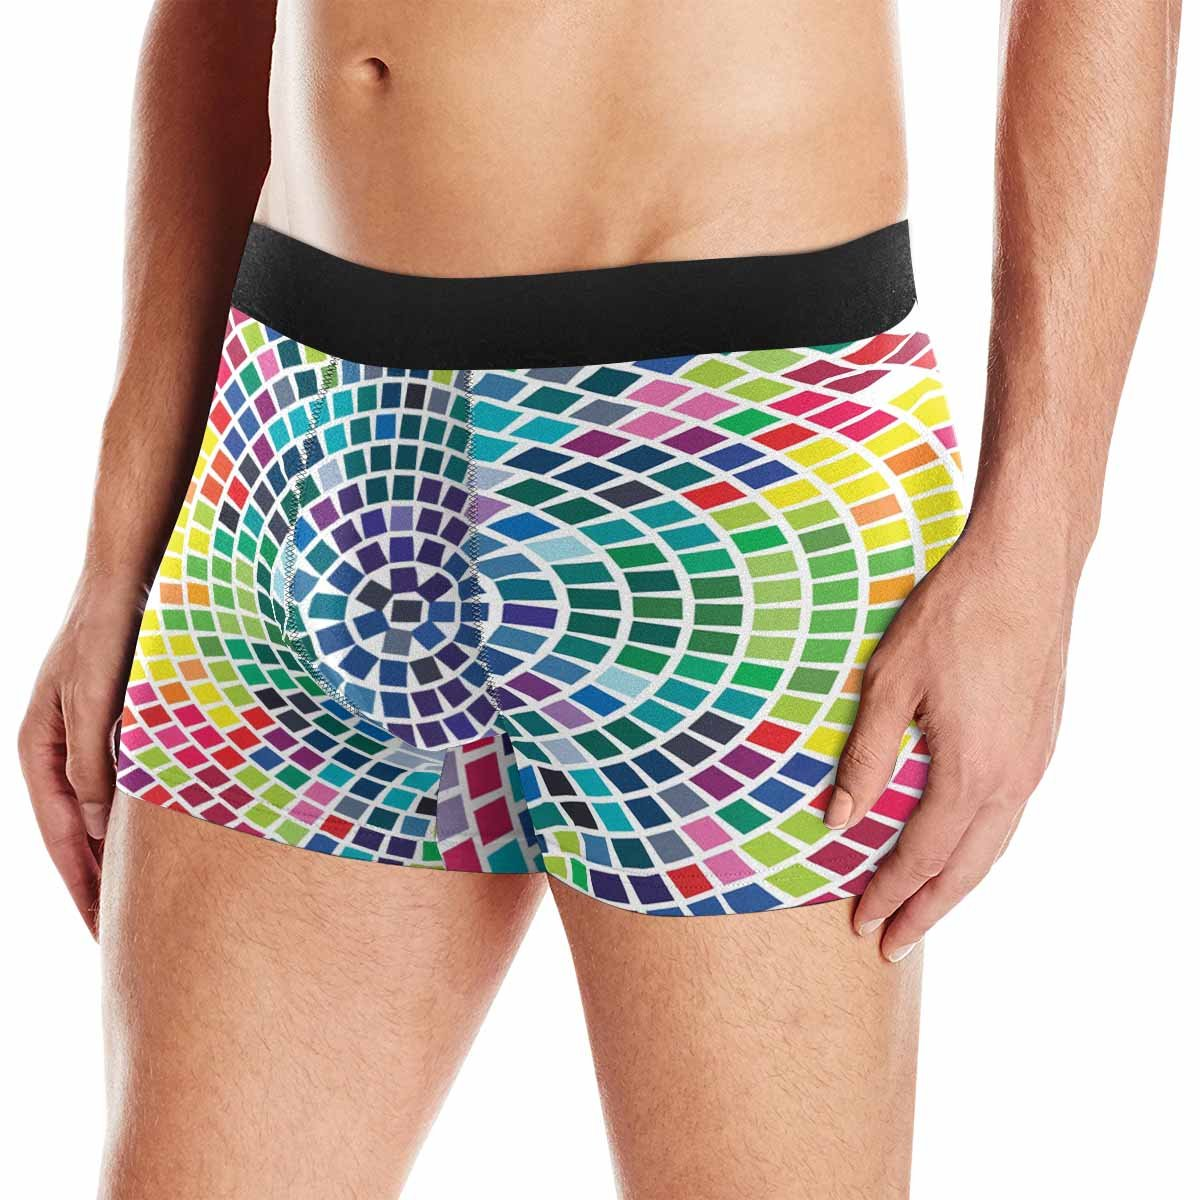 INTERESTPRINT Boxer Briefs Mens Underwear Colorful Mosaic XS-3XL